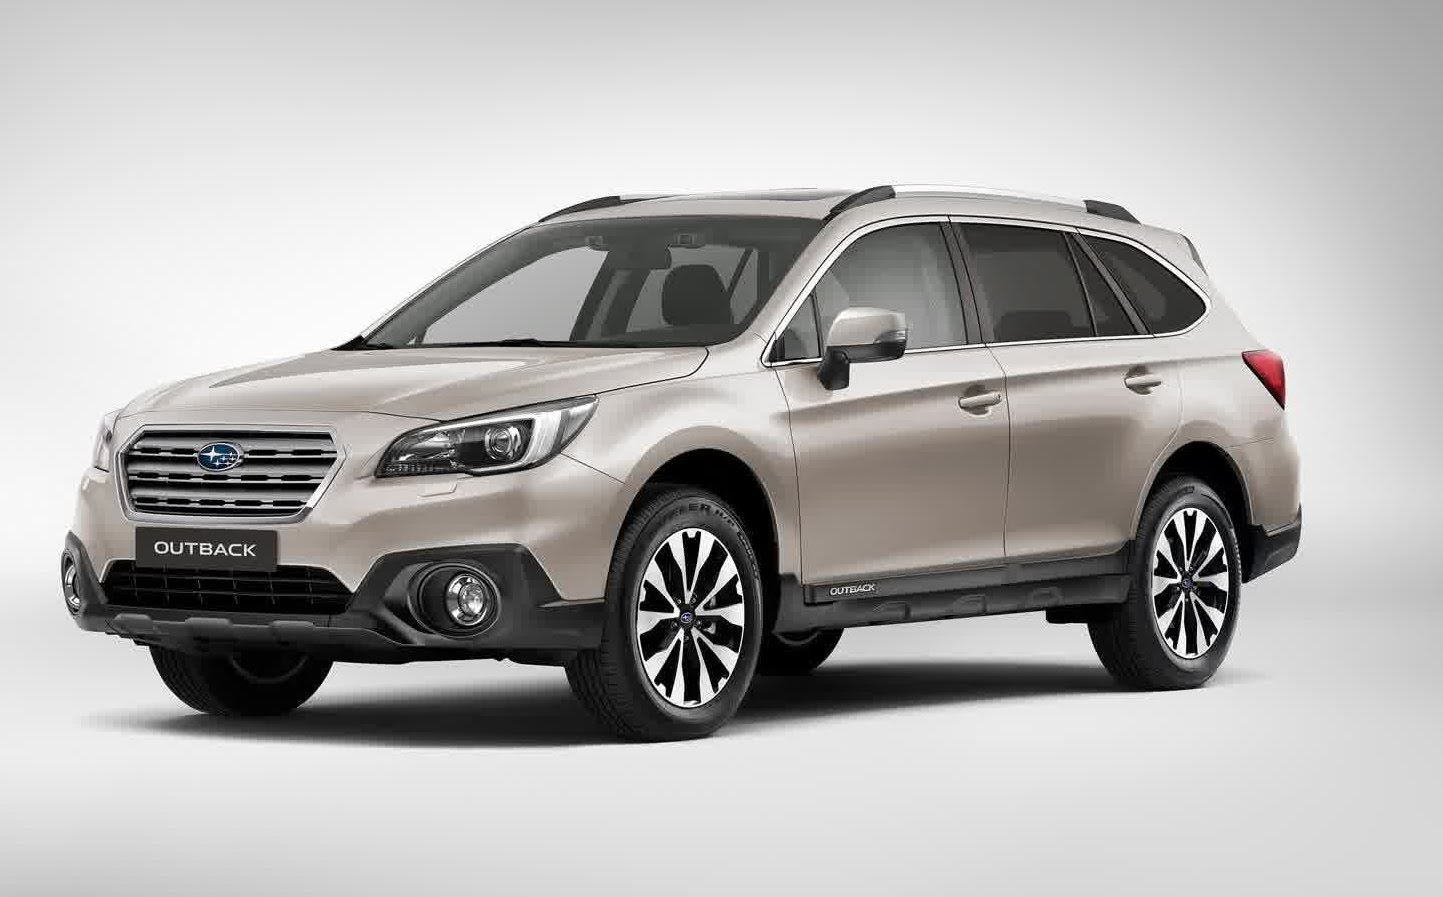 2016 Subaru Outback, 3 Reasons Why the 2016 Subaru Outback Sells So Well